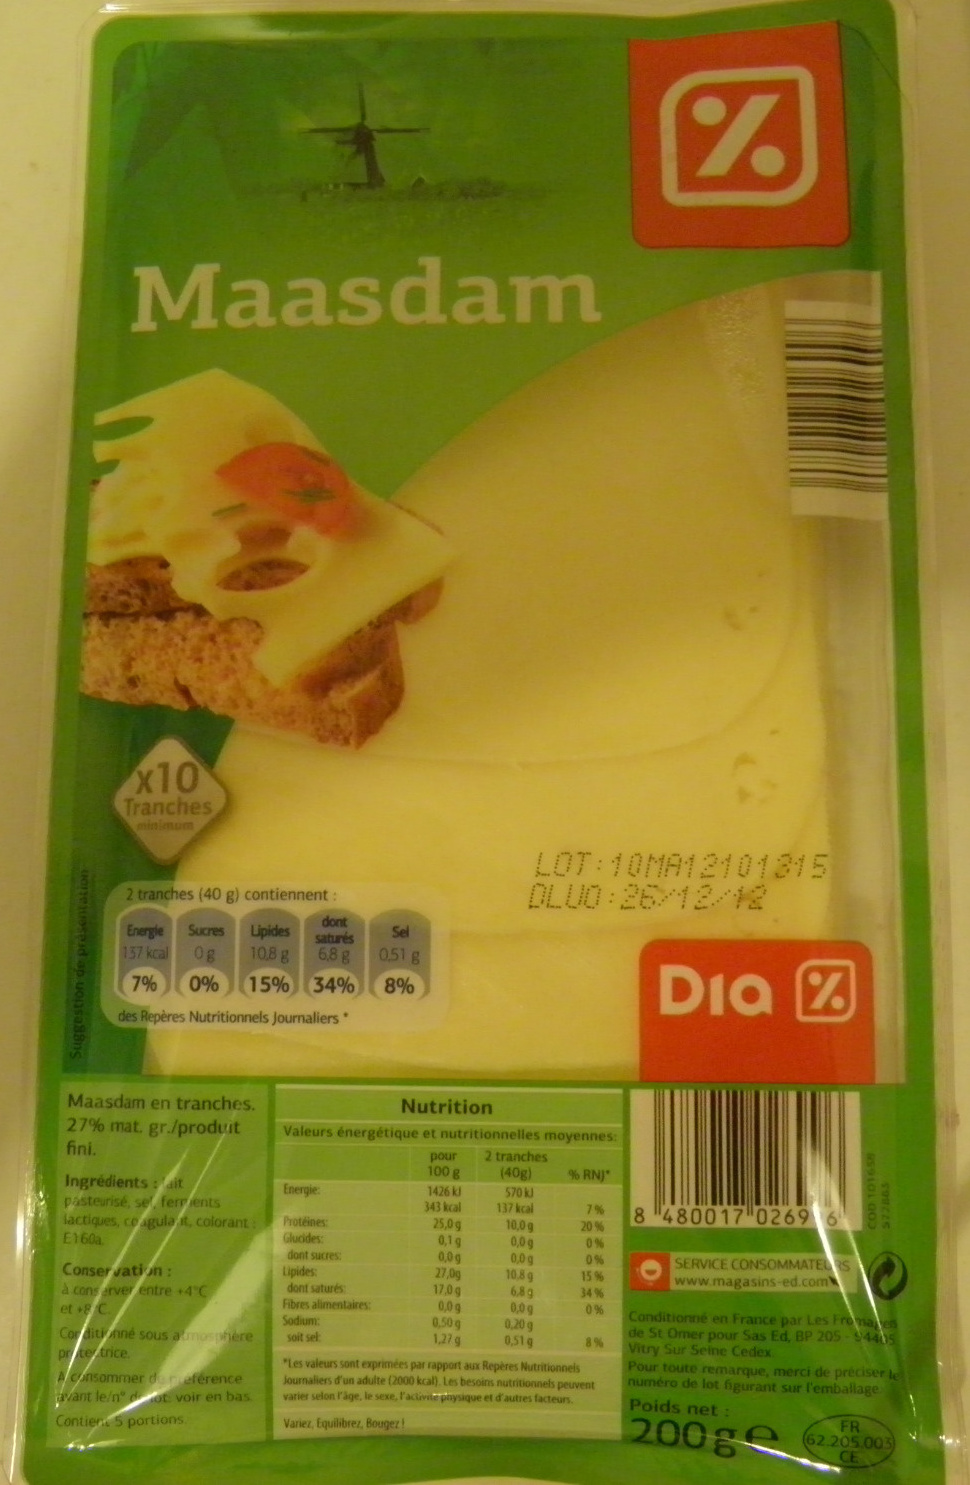 Maasdam (27% MG) x 10 tranches - 200 g - Dia - Product - fr